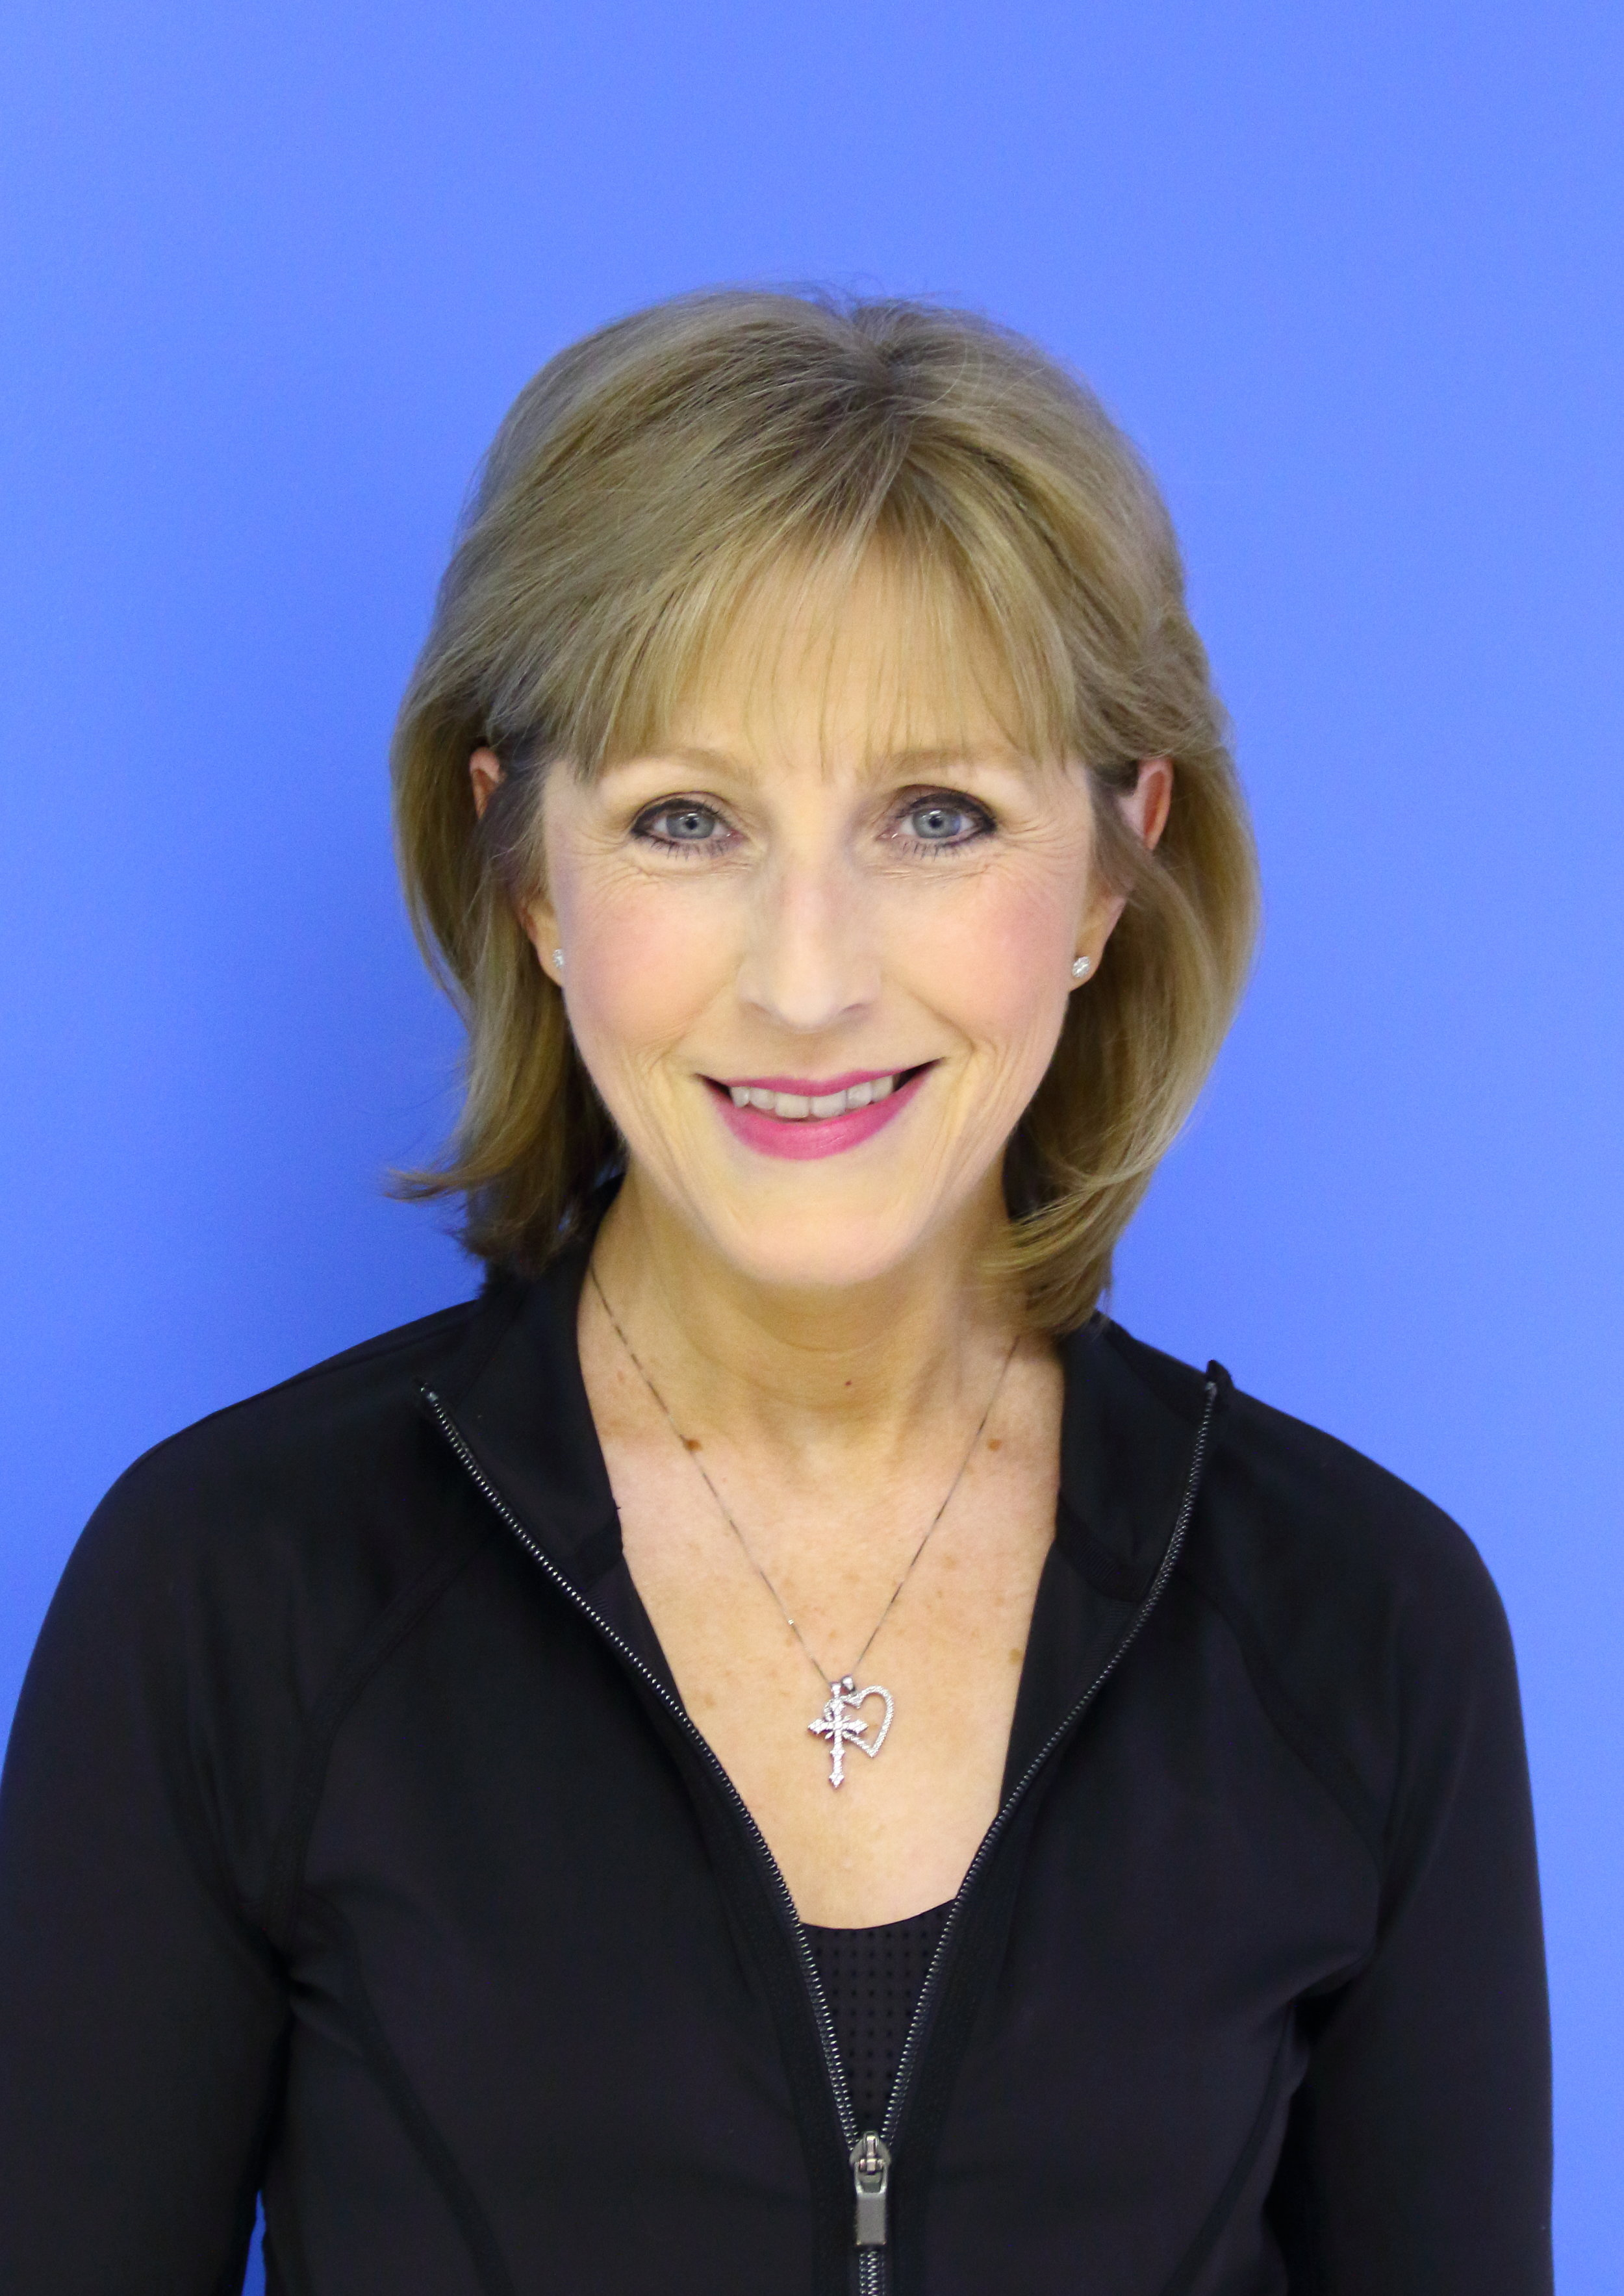 Patti Medley of Patti Medley's Dance Centre